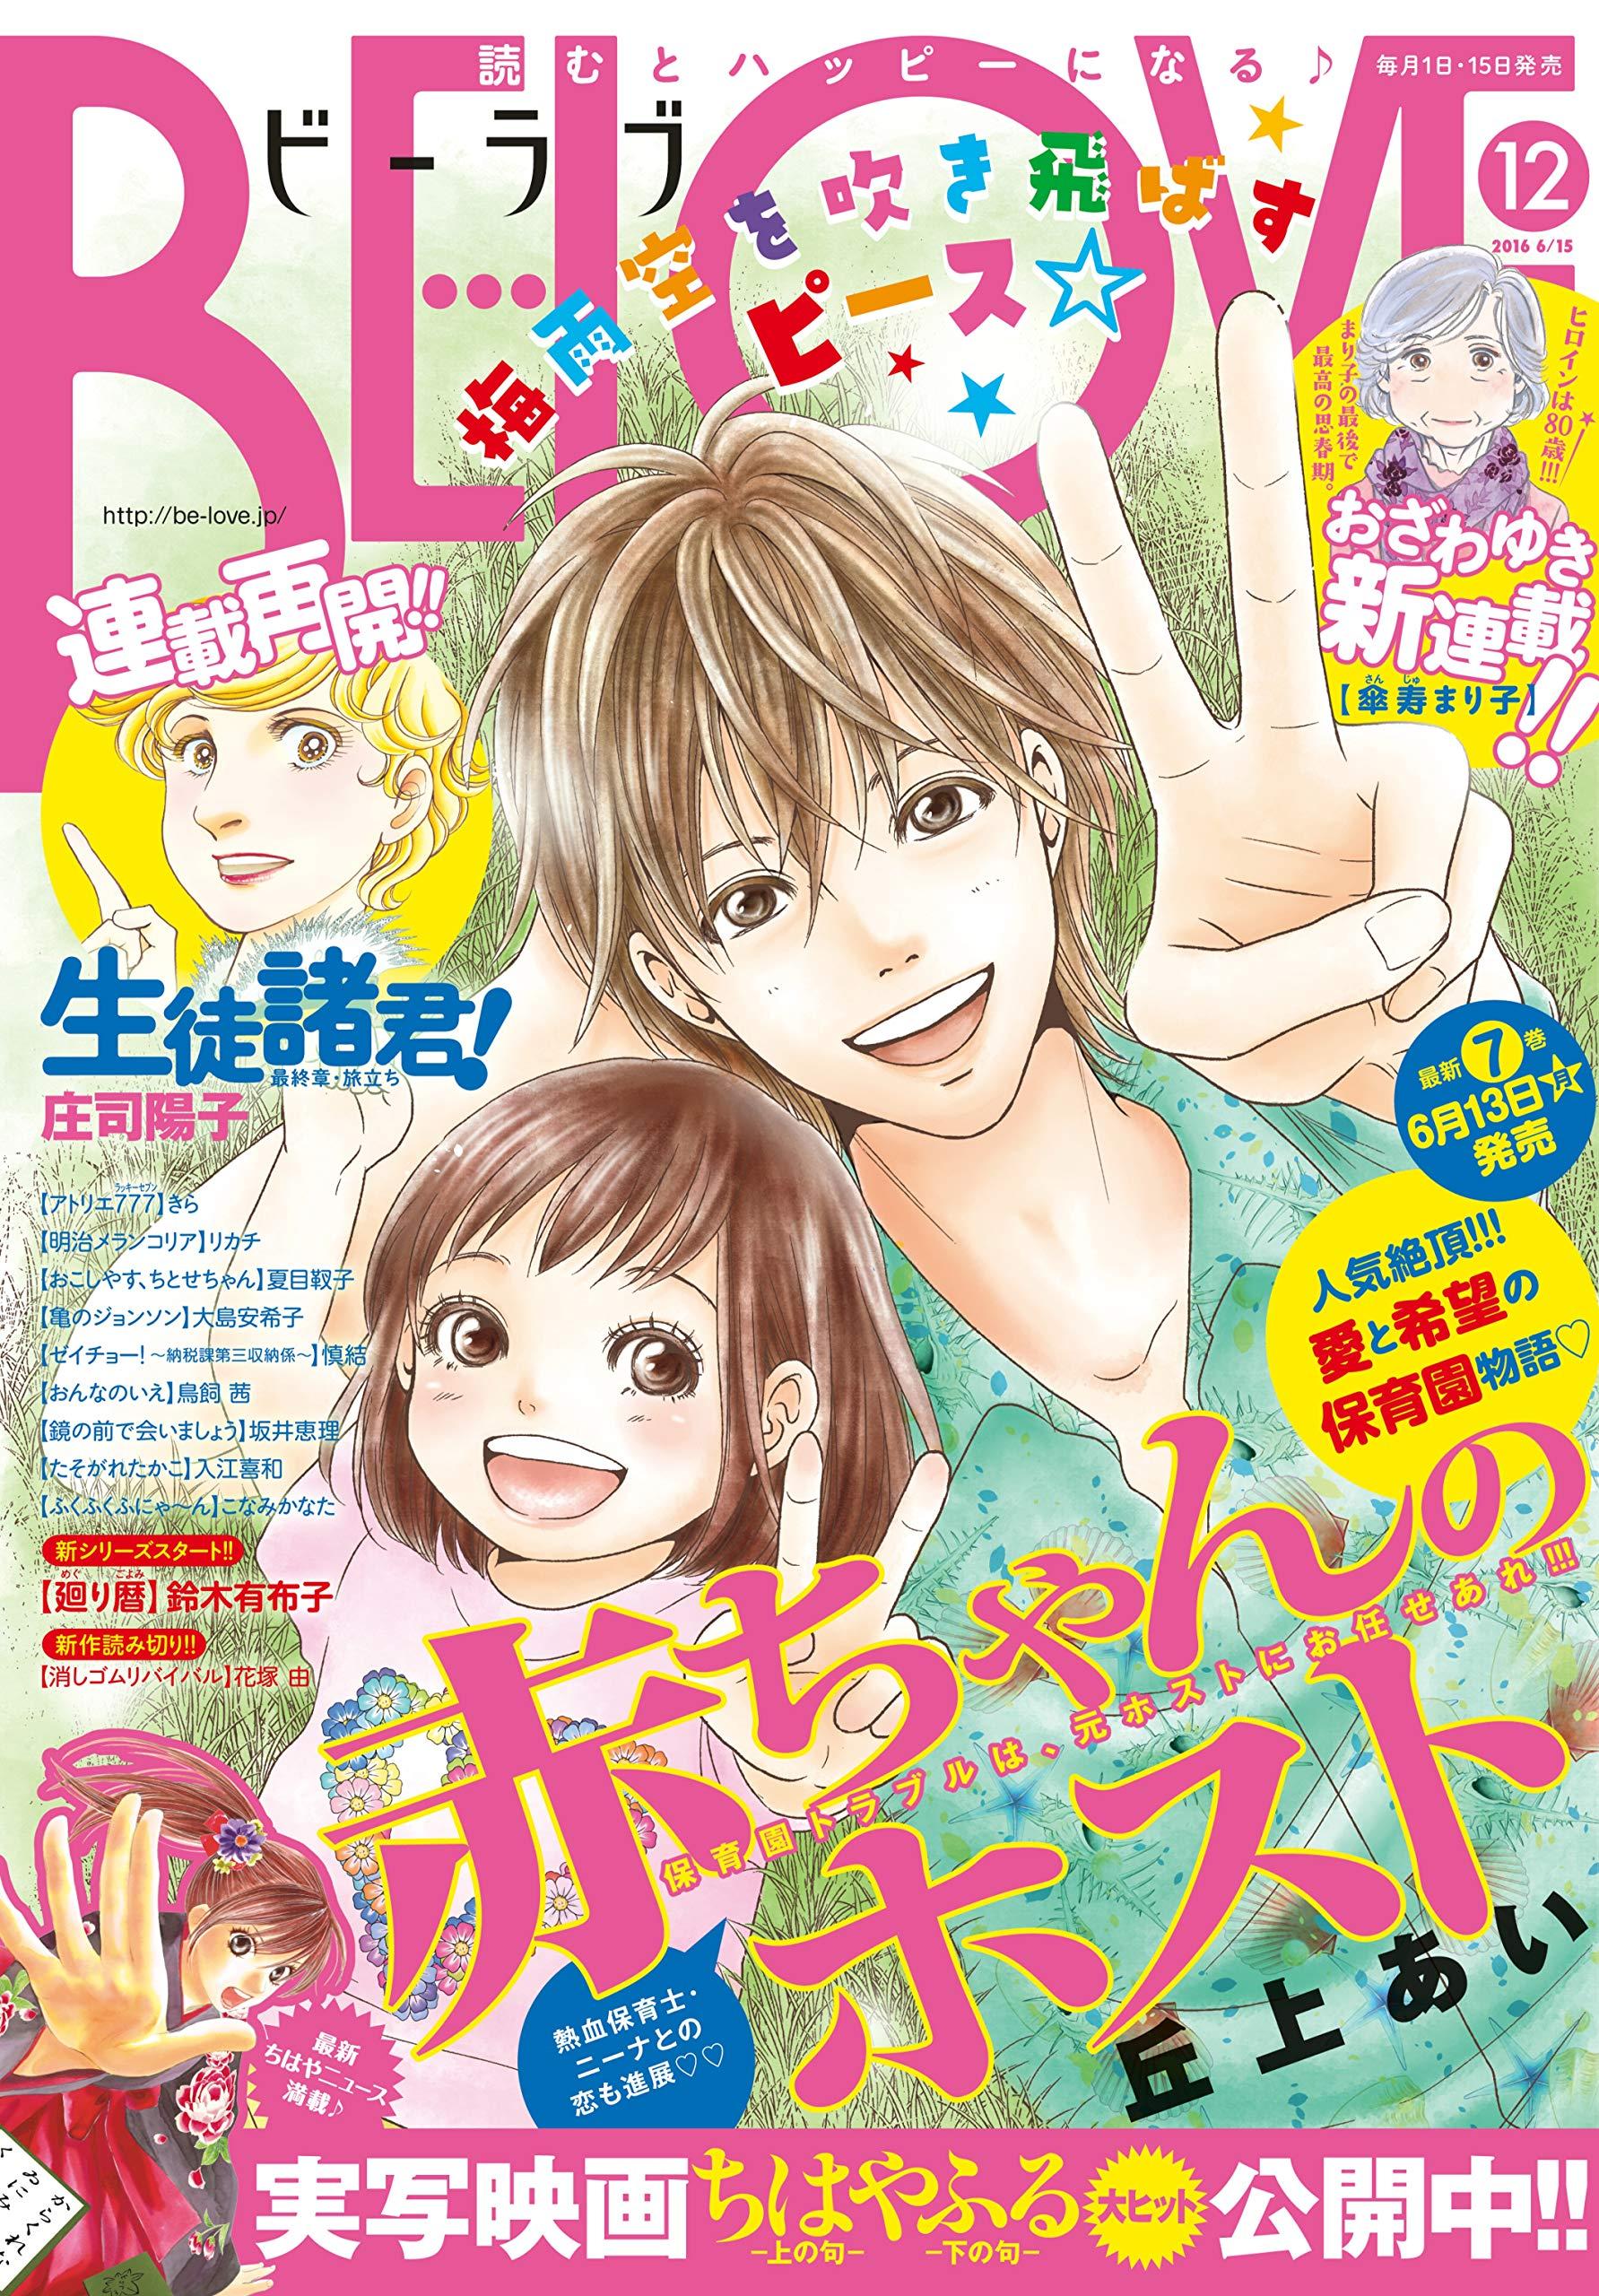 BE-LOVE (ビーラブ) No.12 2016年 6/15号